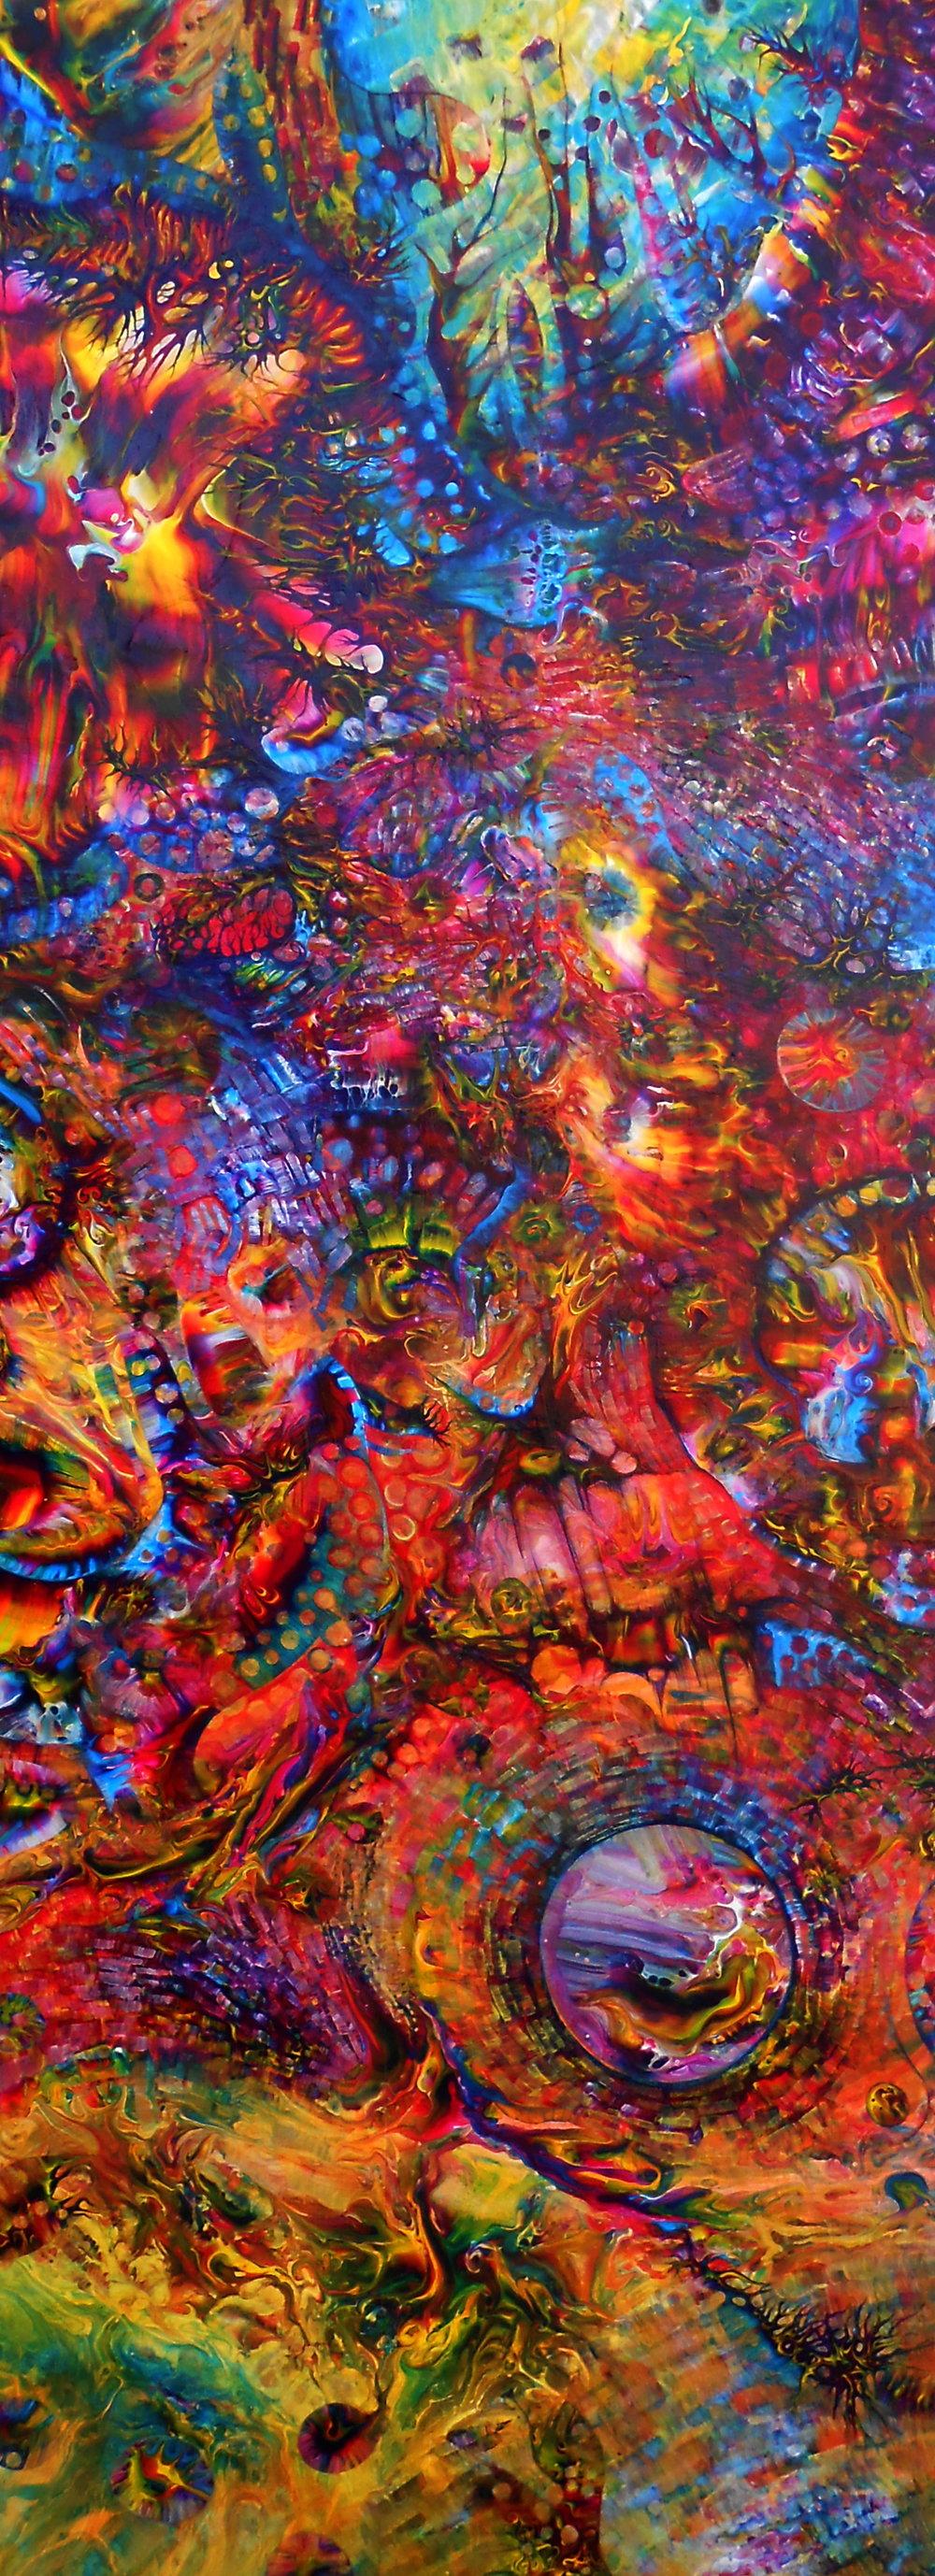 "13.) Kristen Carleton, ""Inside"", 2012, 40cm x 86cm, Acrylic on Polymer.JPG"